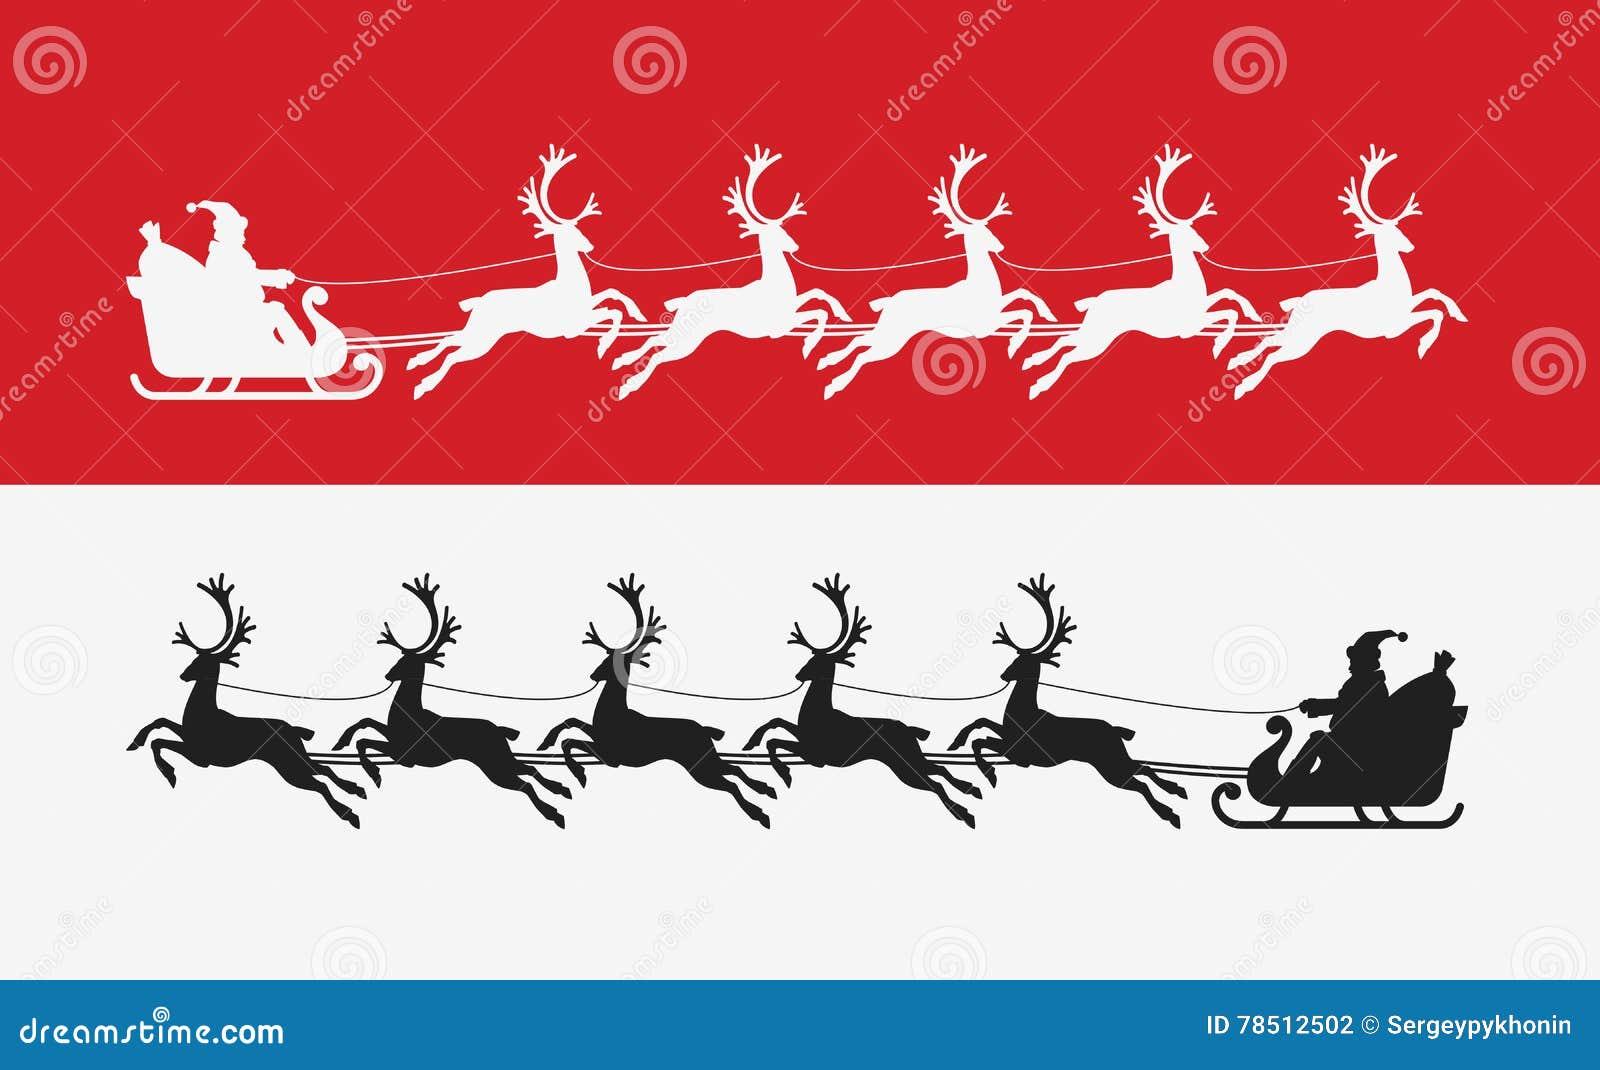 Sleigh Ride Christmas Banner